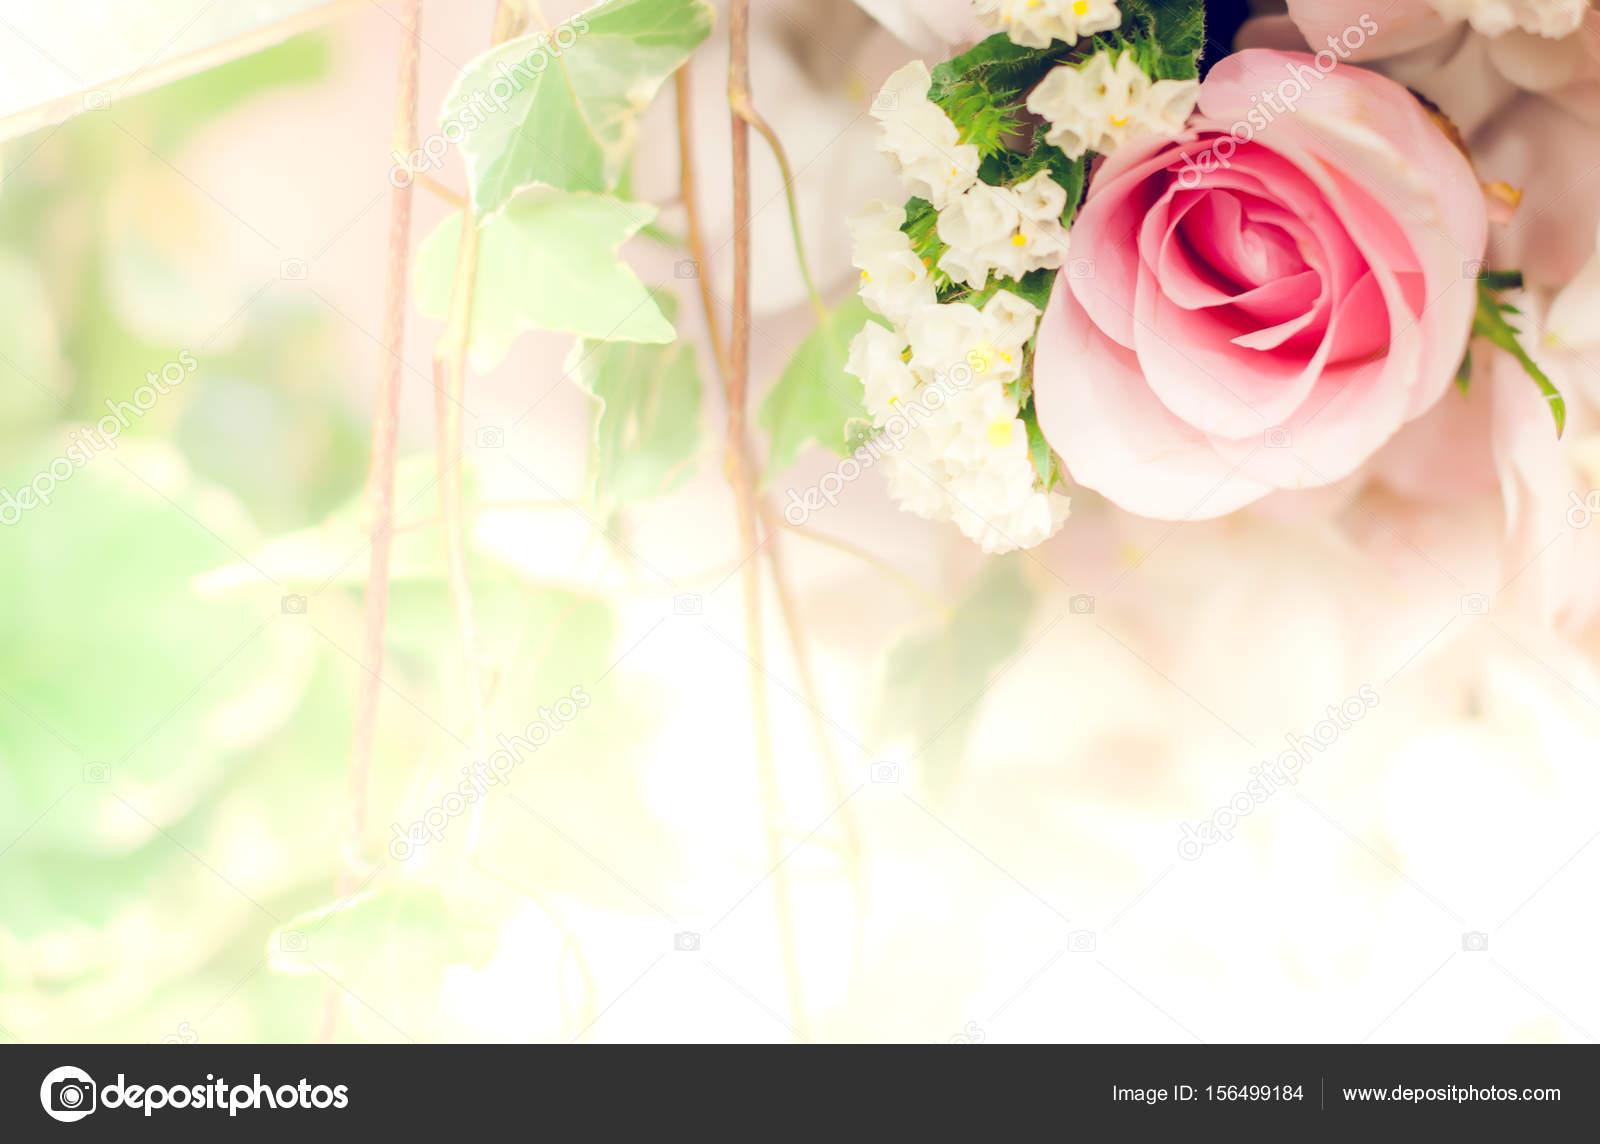 Fondos De Pantalla De Flores Hermosas: Fondo De Flor Hermosa Fondo De Pantalla Hecha Con Filtros